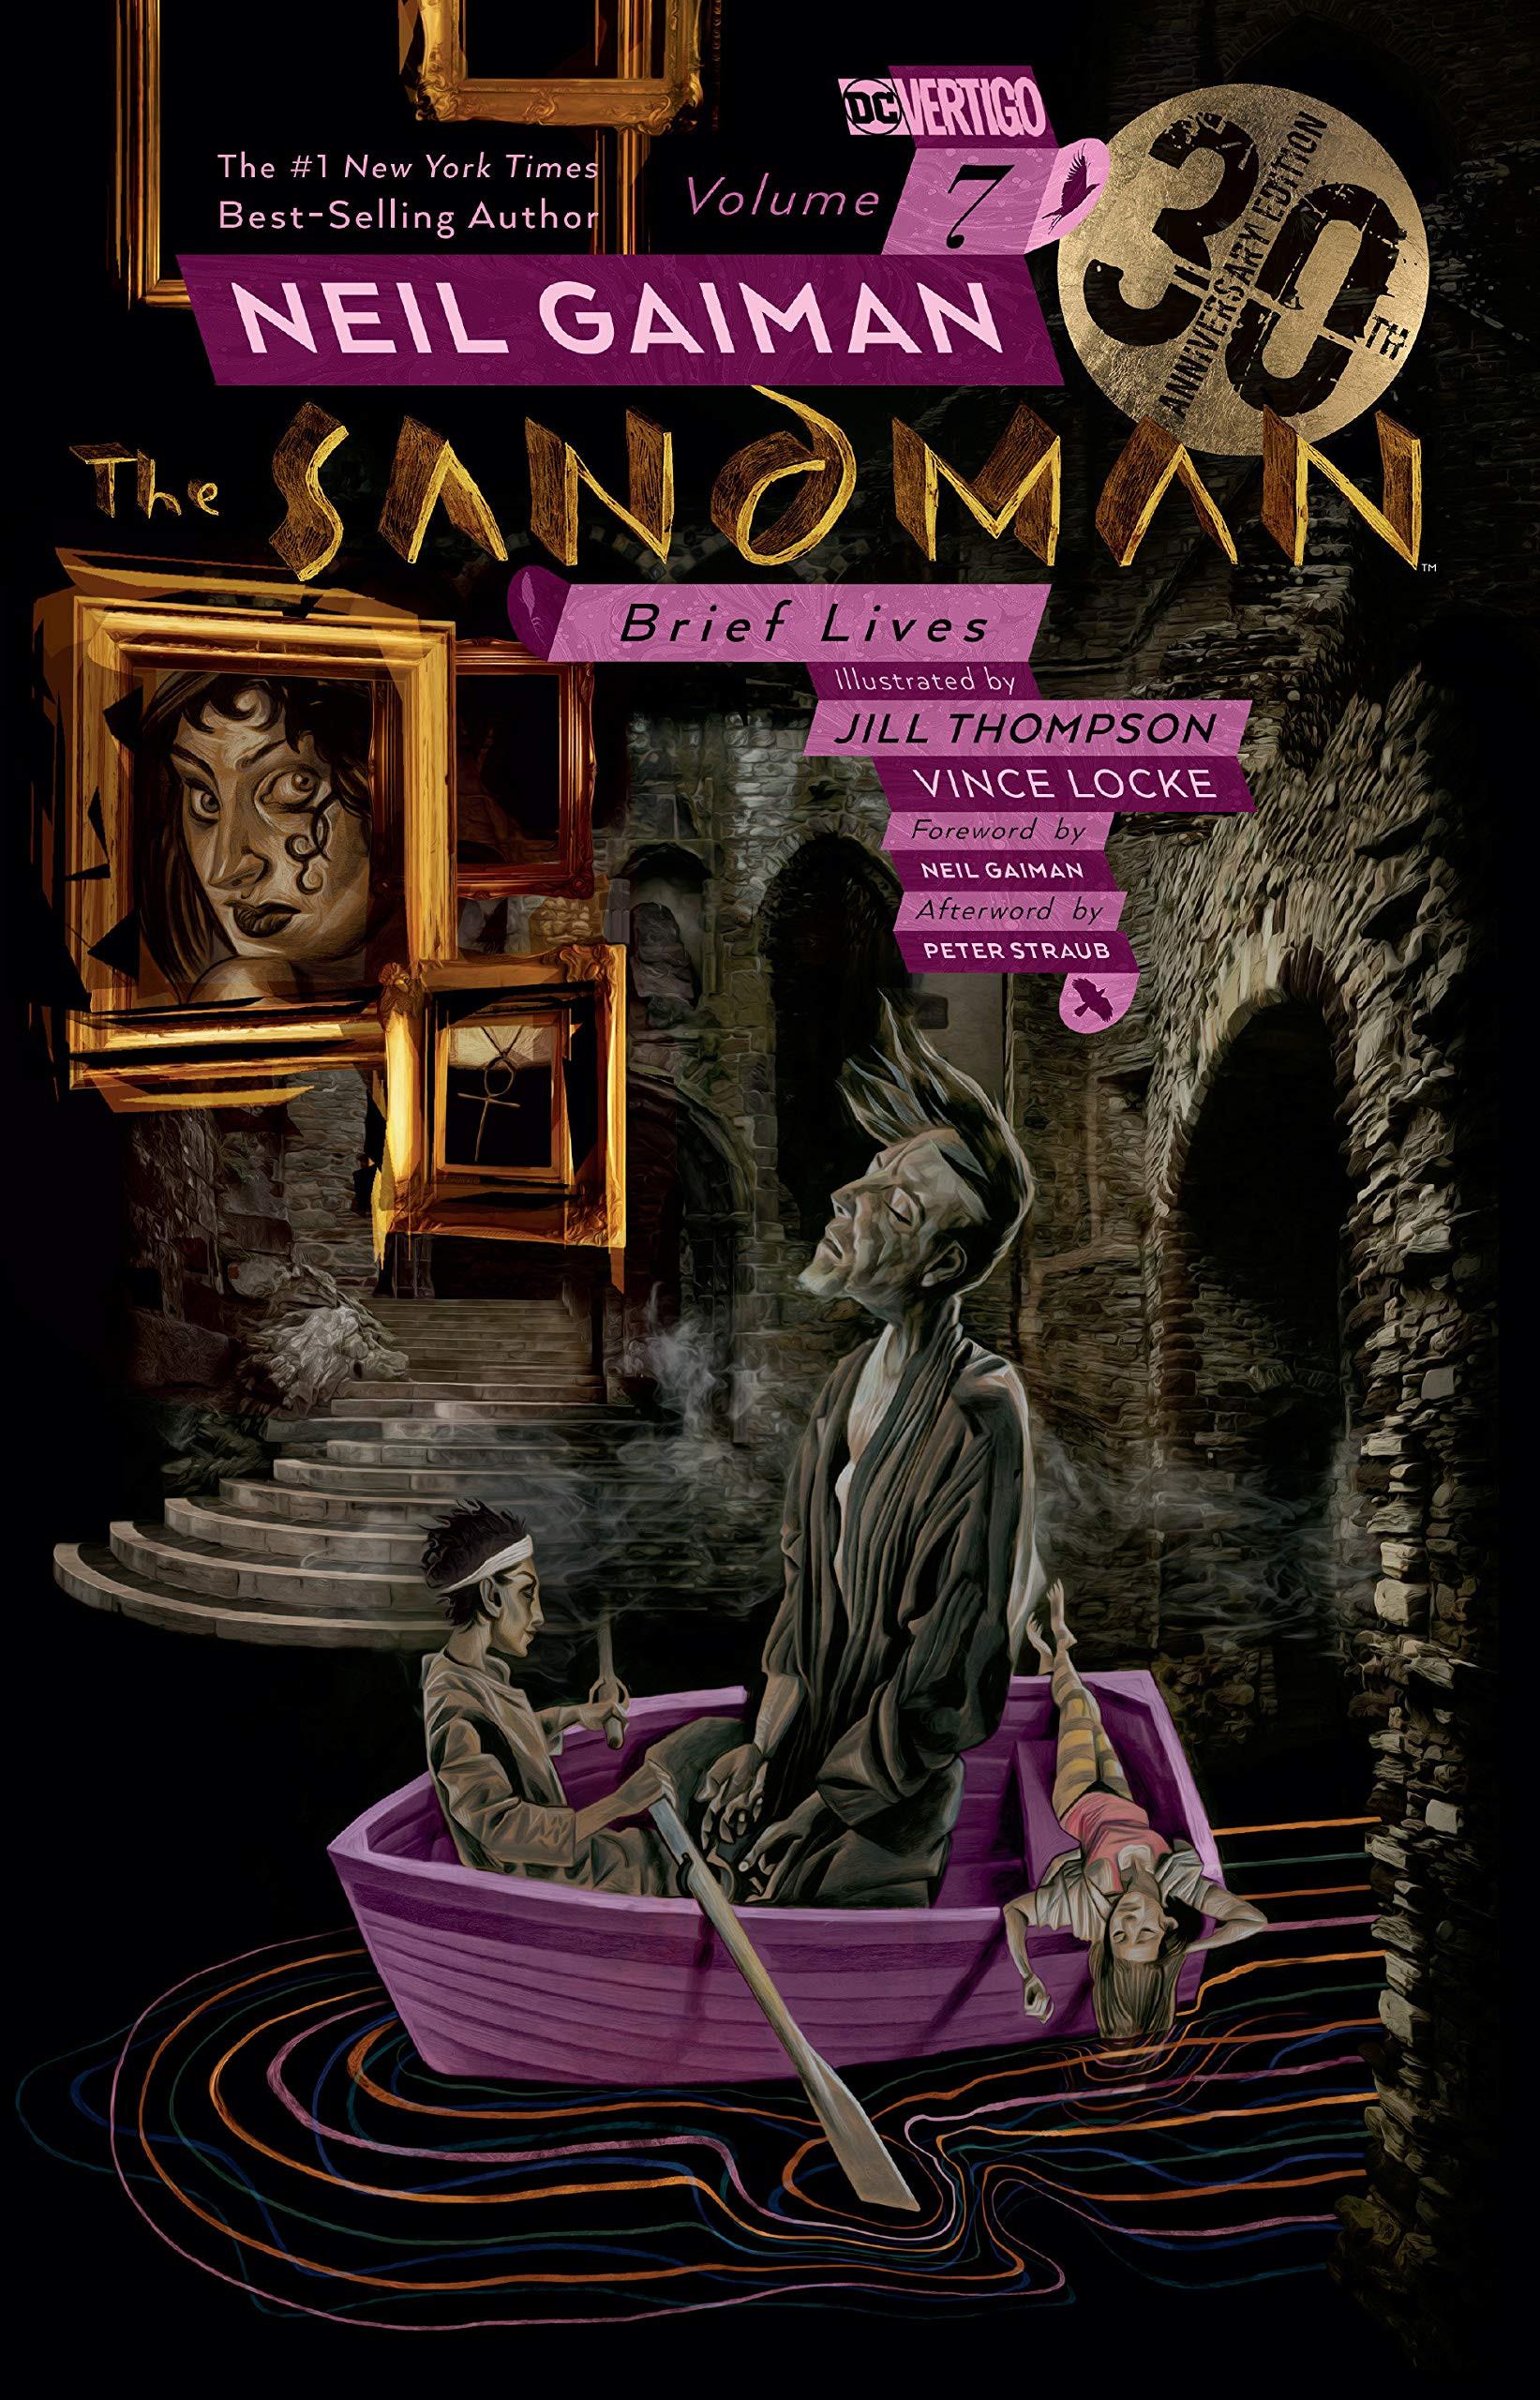 The Sandman 7 - Brief Lives 30th Anniversary Edition